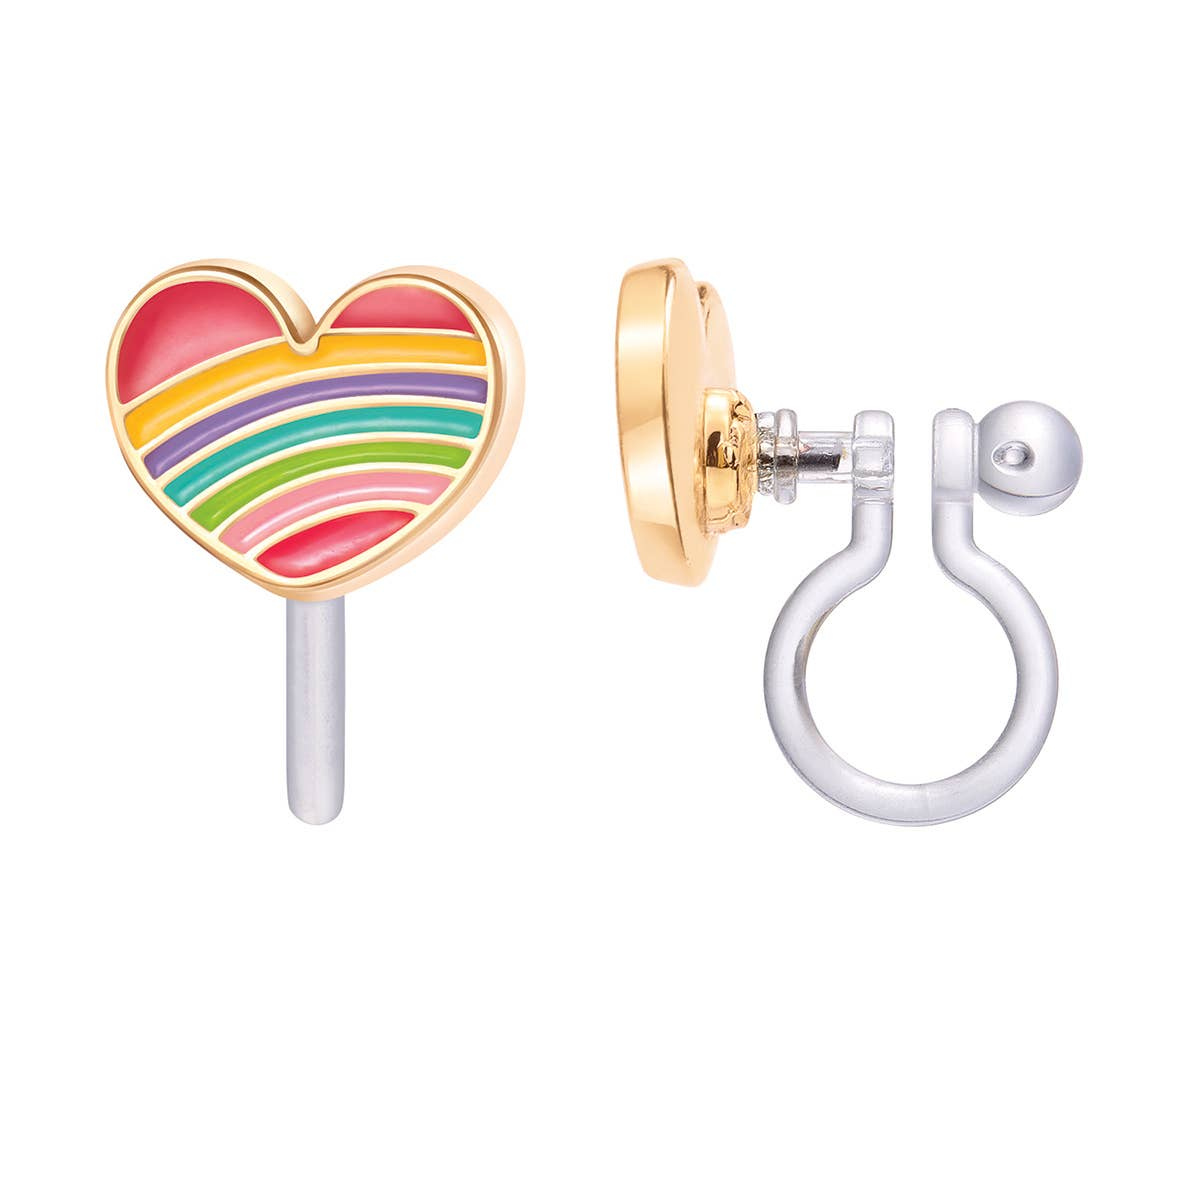 CLIP ON Cutie Earrings- Rainbow Heart | Trada Marketplace